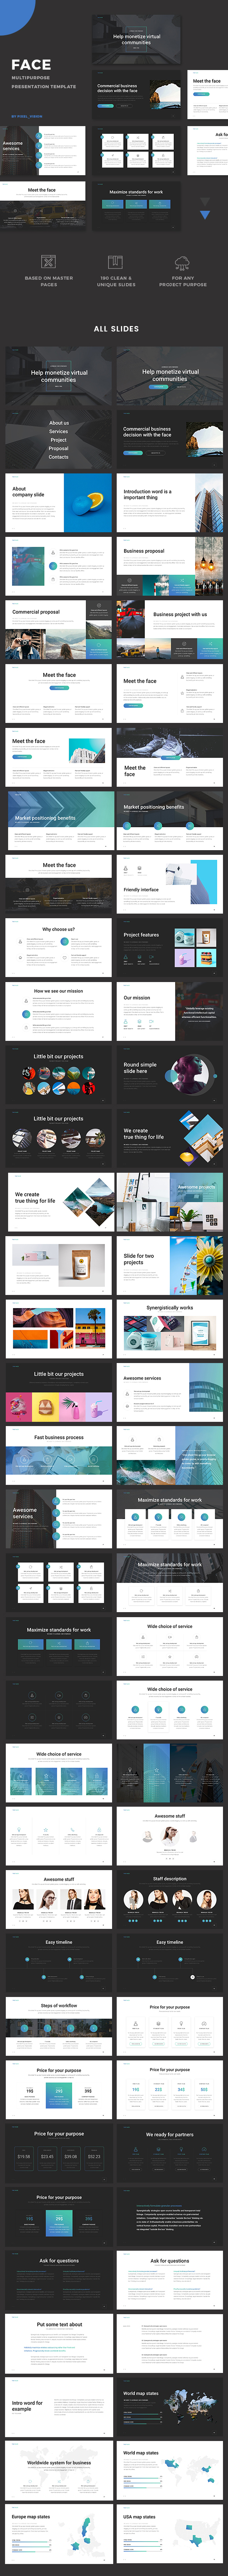 Company Presentation - PowerPoint Templates Presentation Templates